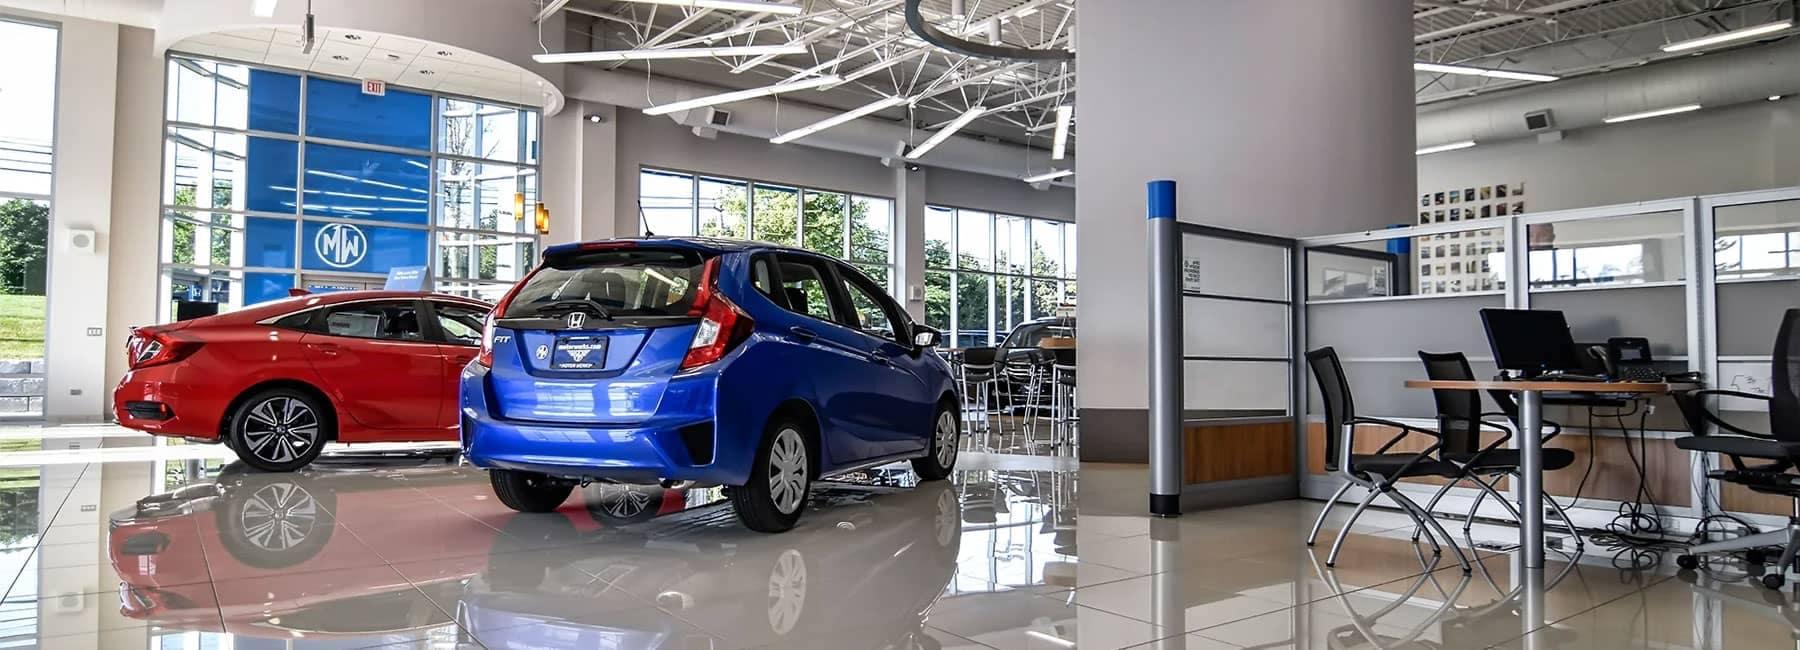 Motors Werks Honda Interior Showroom